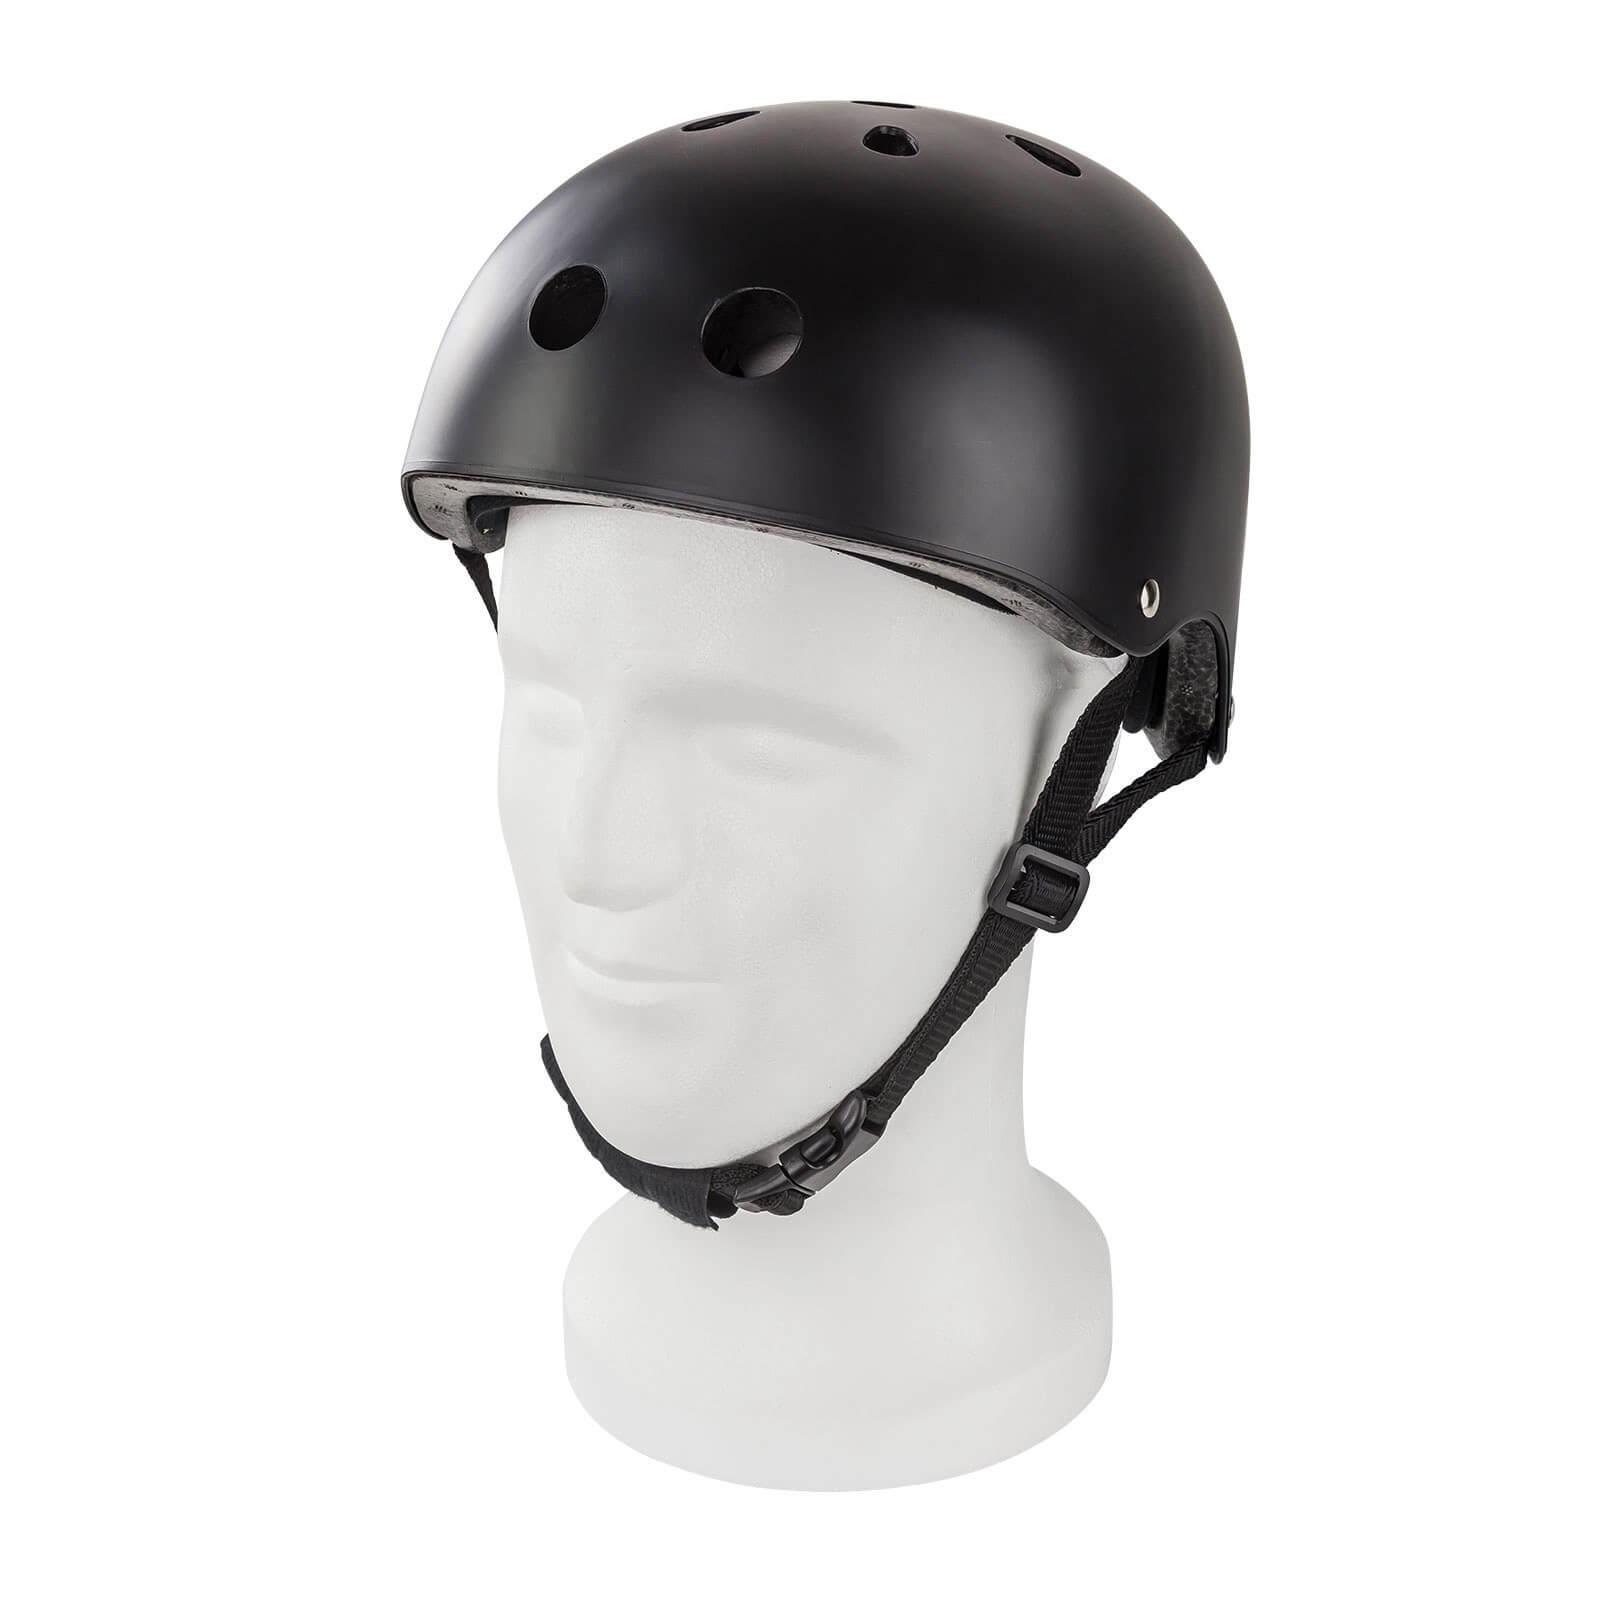 Dema Skaterhelm / Fahrradhelm Schwarz matt Größe L 11227